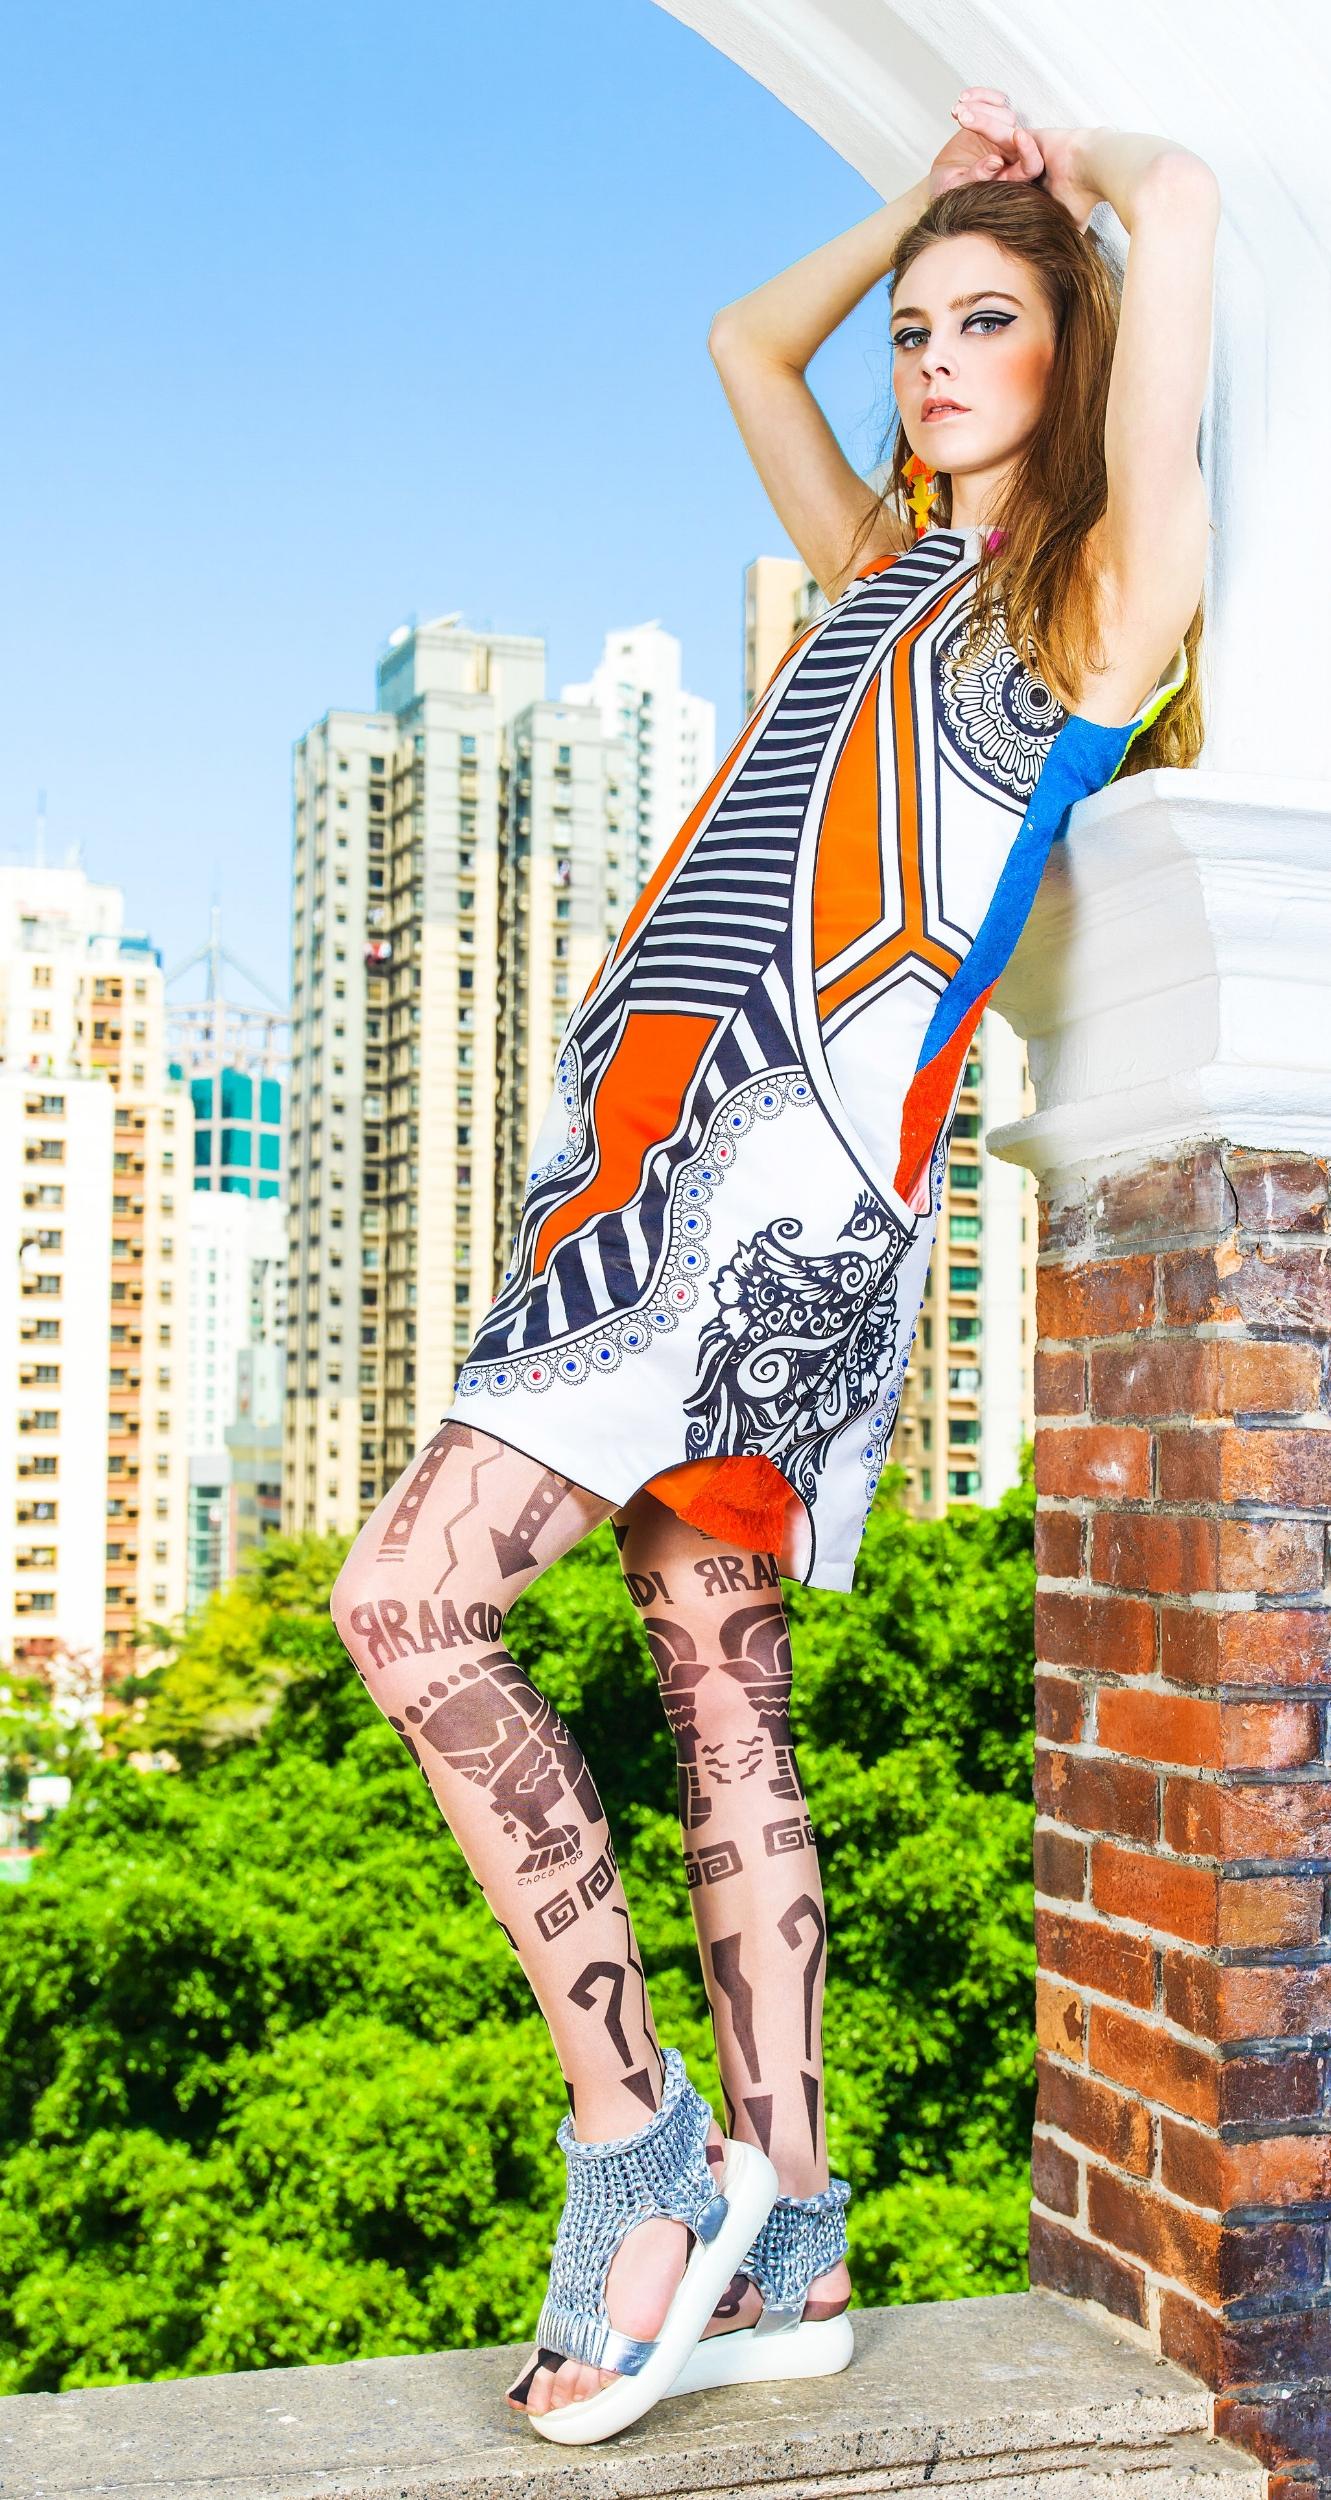 Cindy-Kwok-Fashion-Shoot-4.jpg